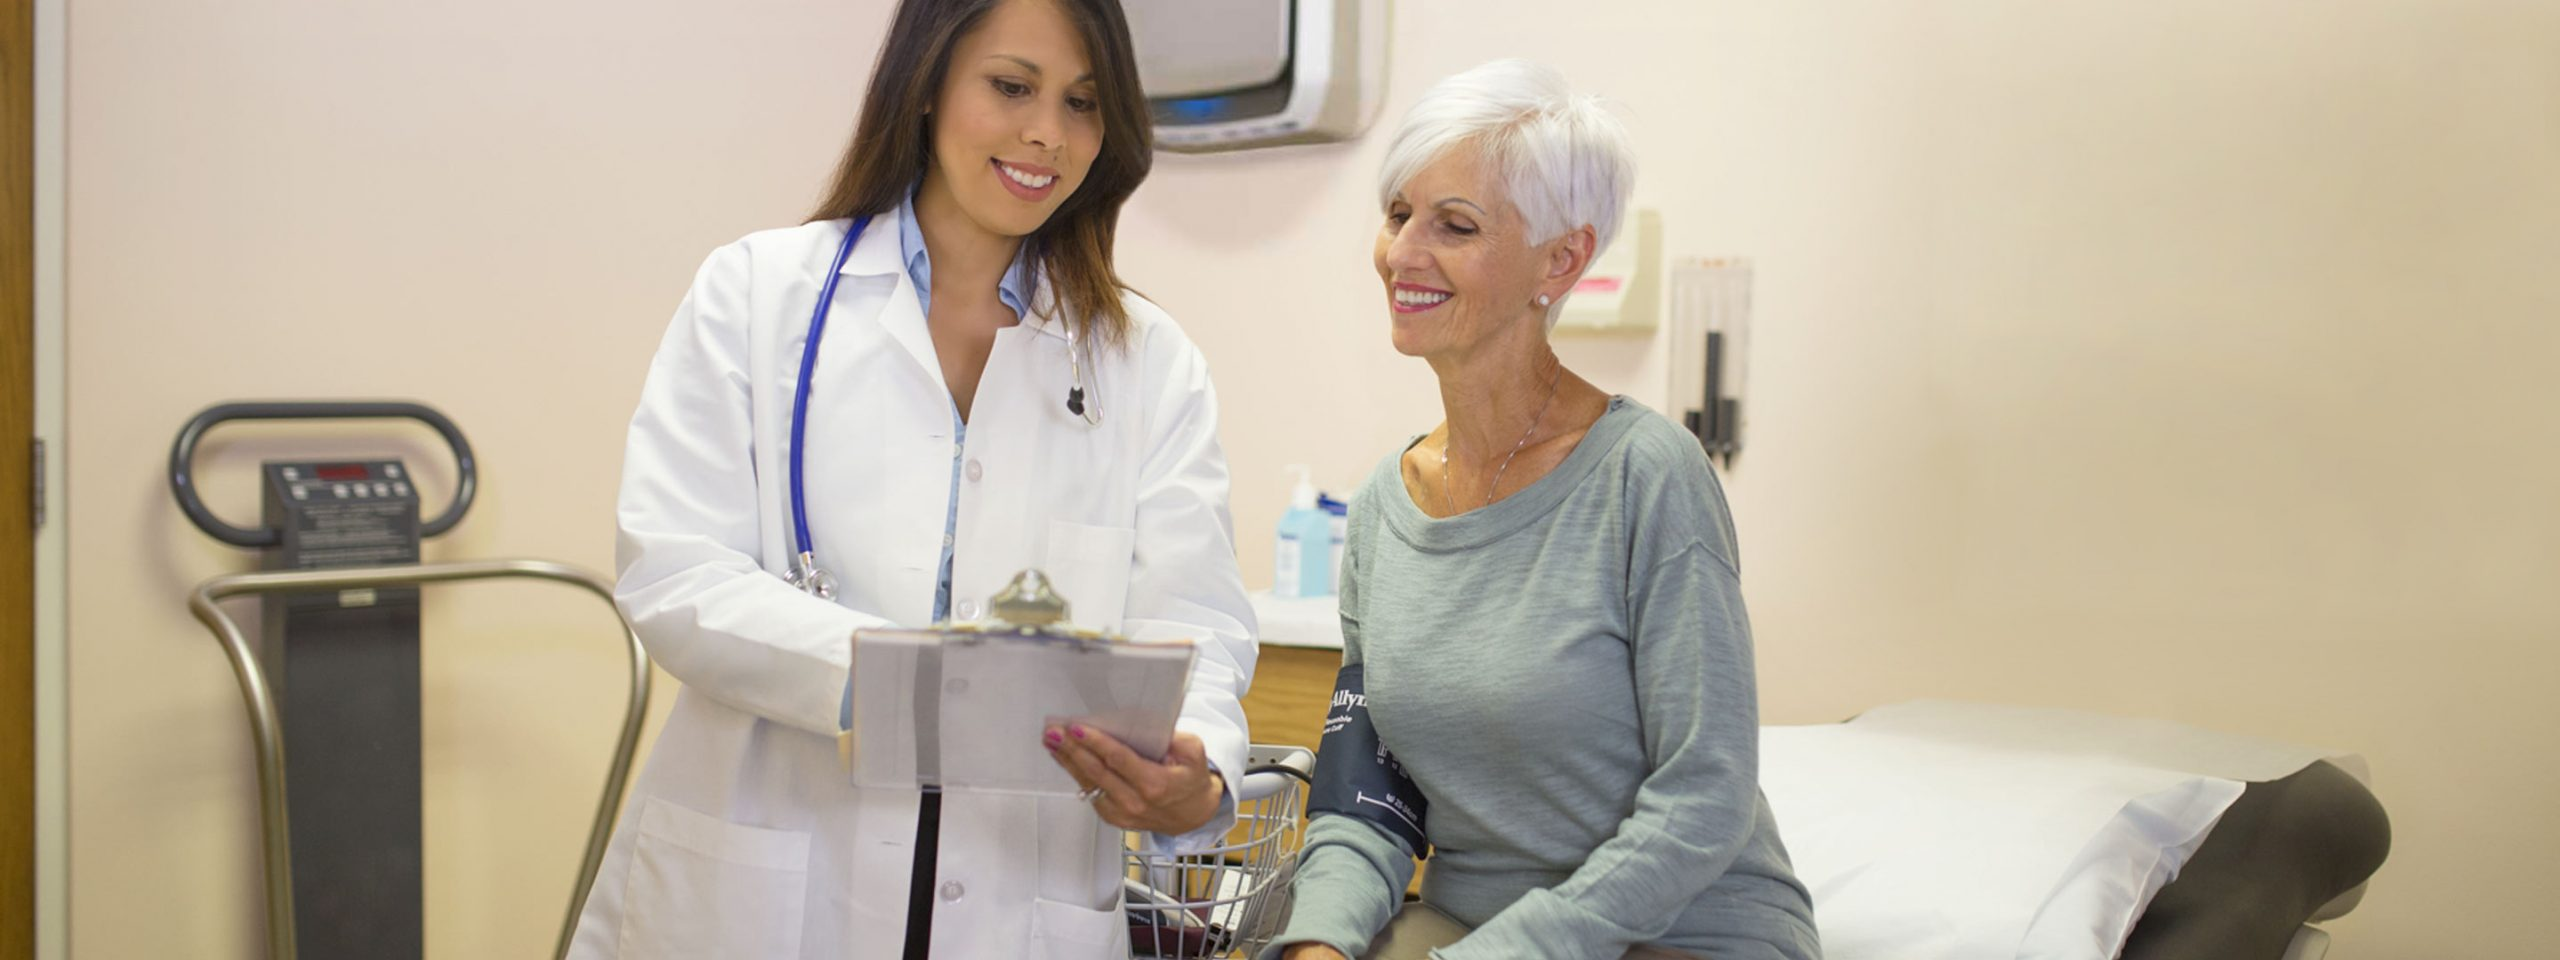 AeraMaxPro-Healthcare-Industry-HeadersAMPIII